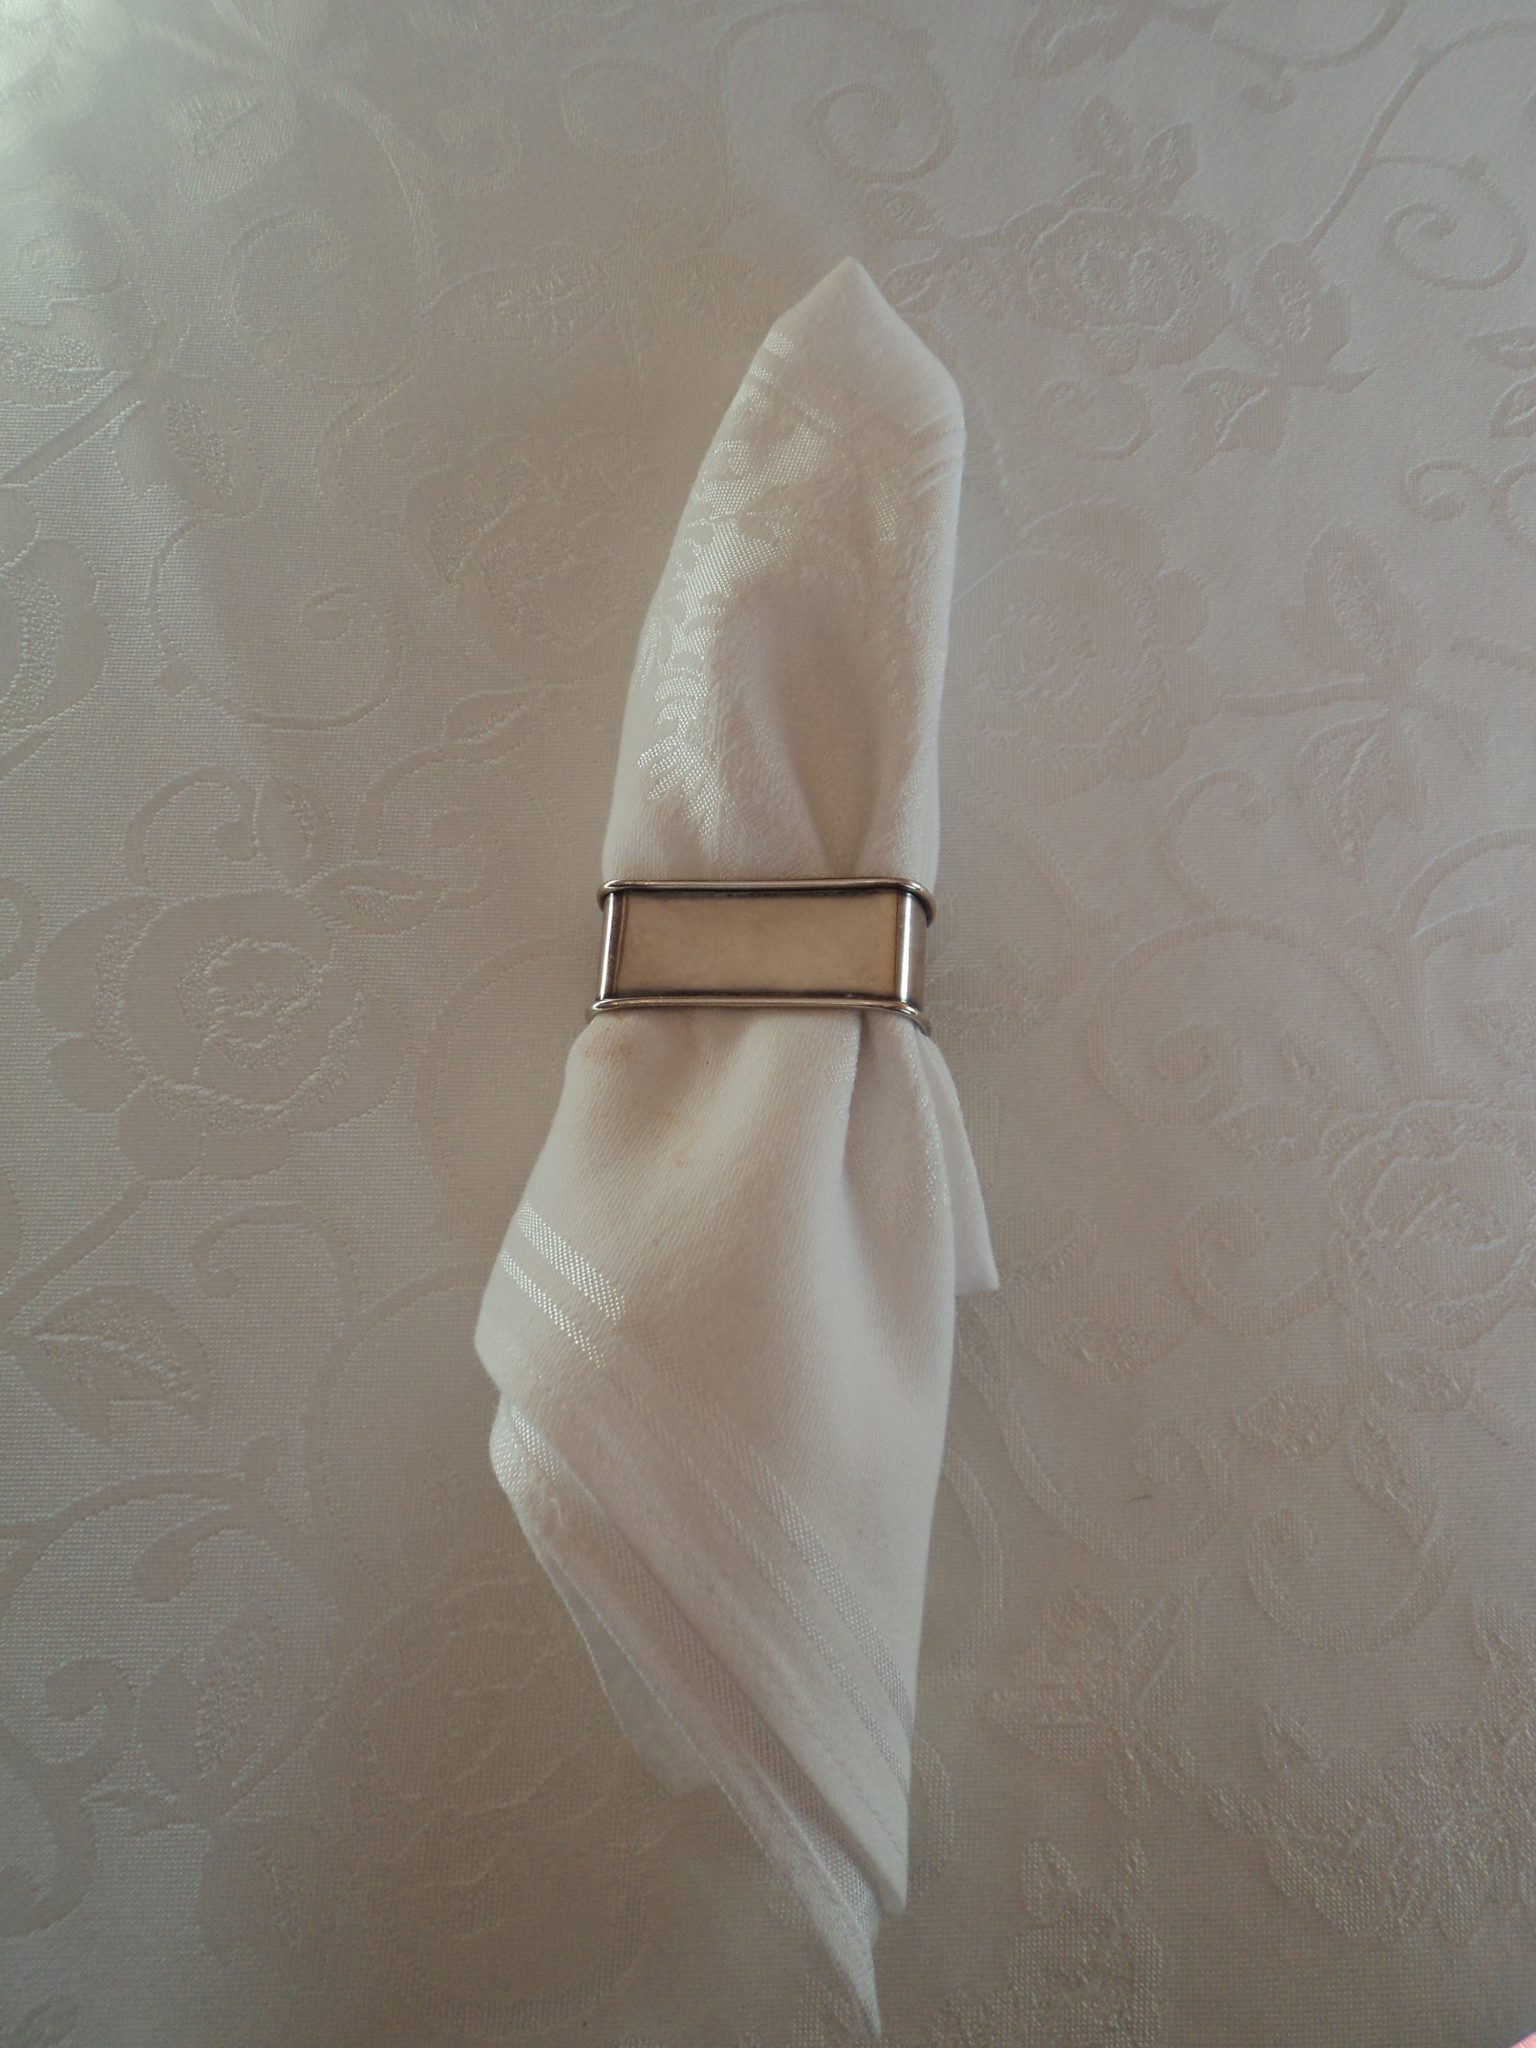 White damask napkin pulled through a silver napkin ring